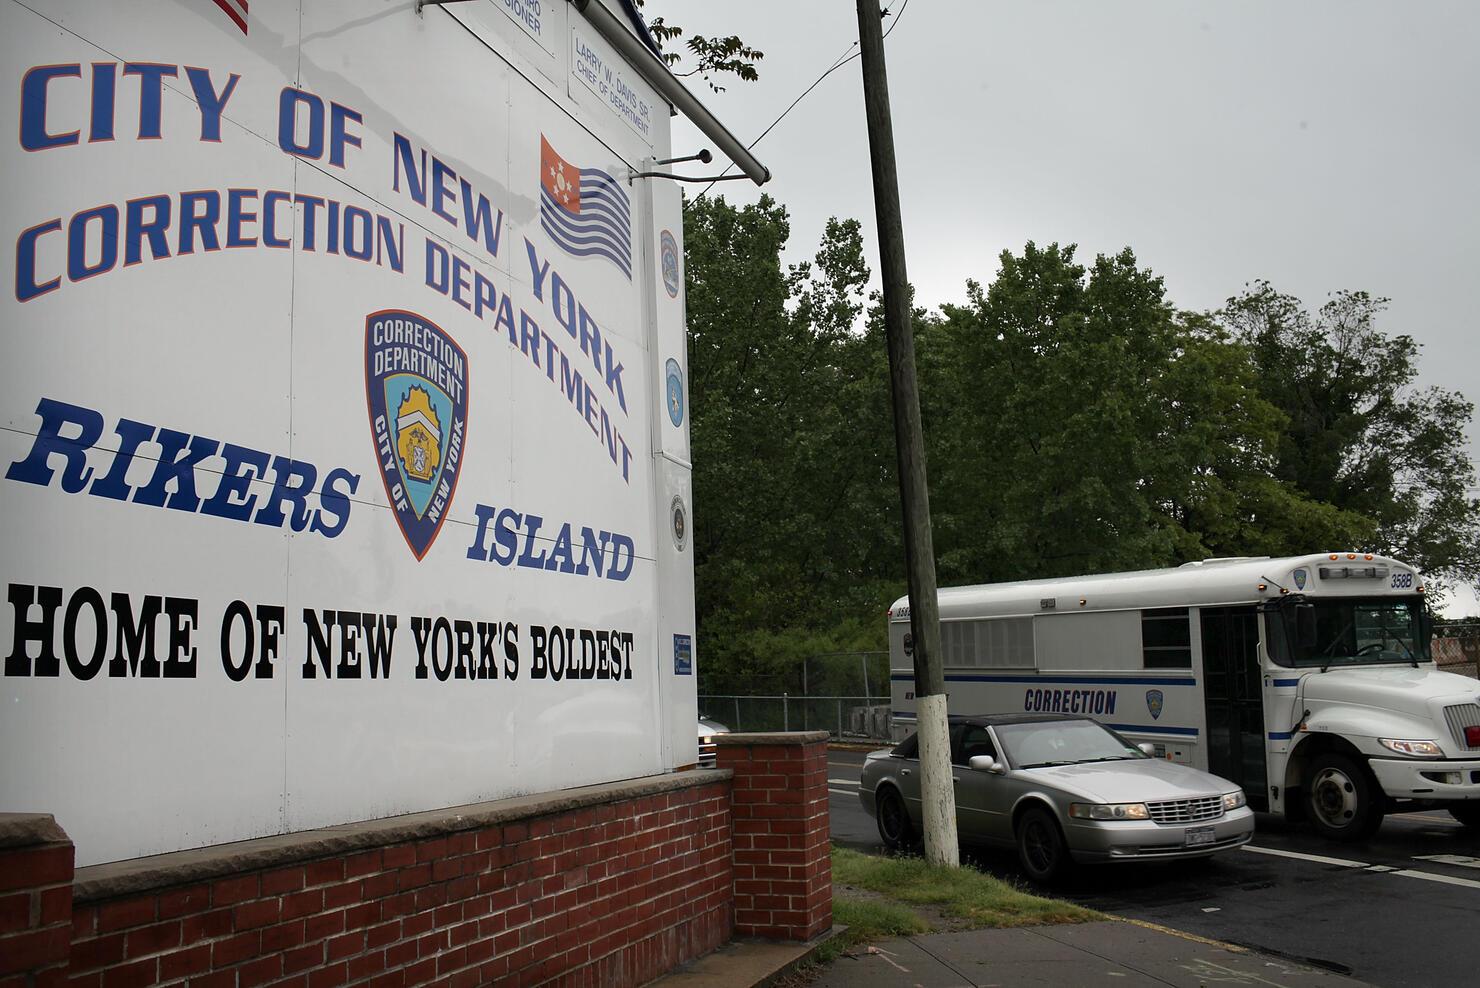 IMF Chief Dominique Strauss-Kahn Held New York City Rikers Island Prison